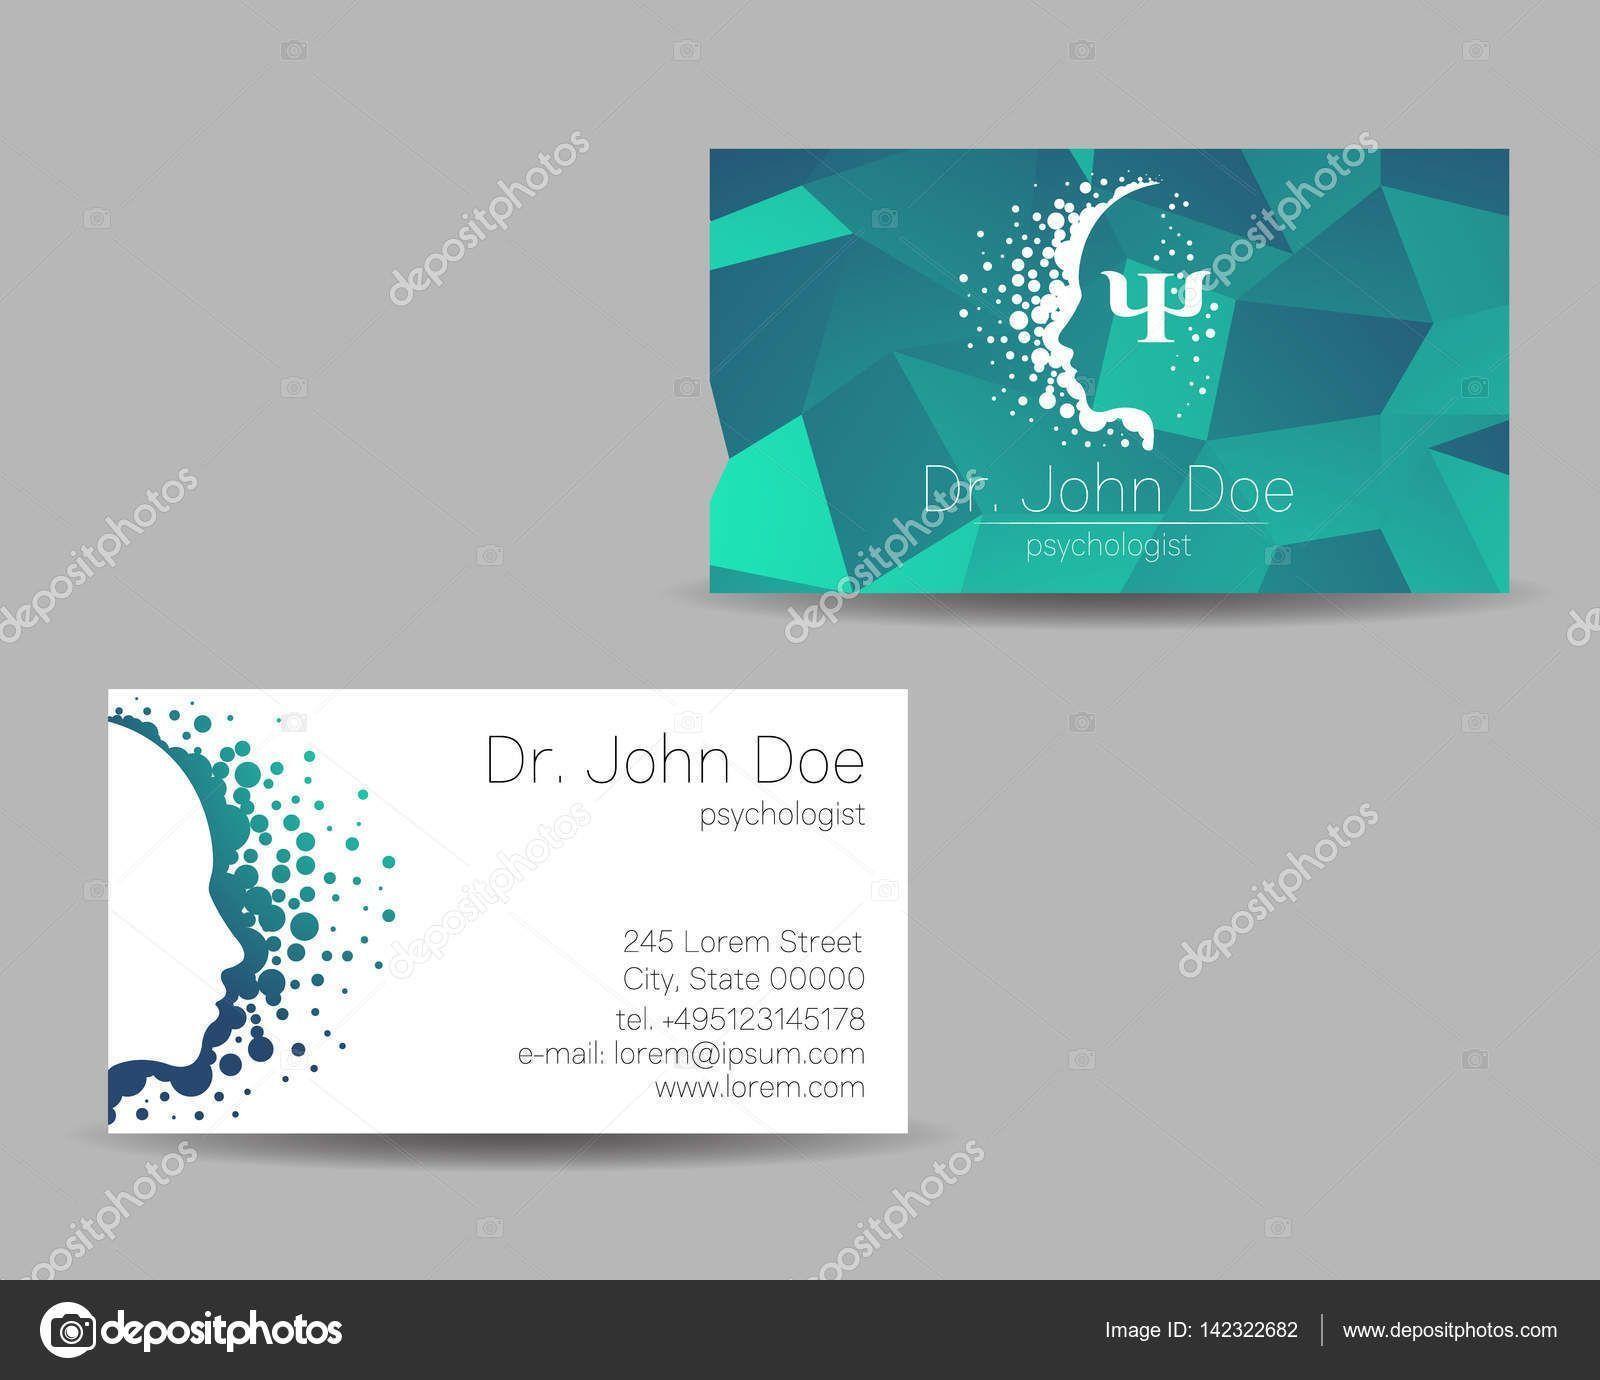 Design Templates Creative Business Cards For Psychologists Template Design Check More At H творческие визитные карточки дизайн визитной карточки визитки салона